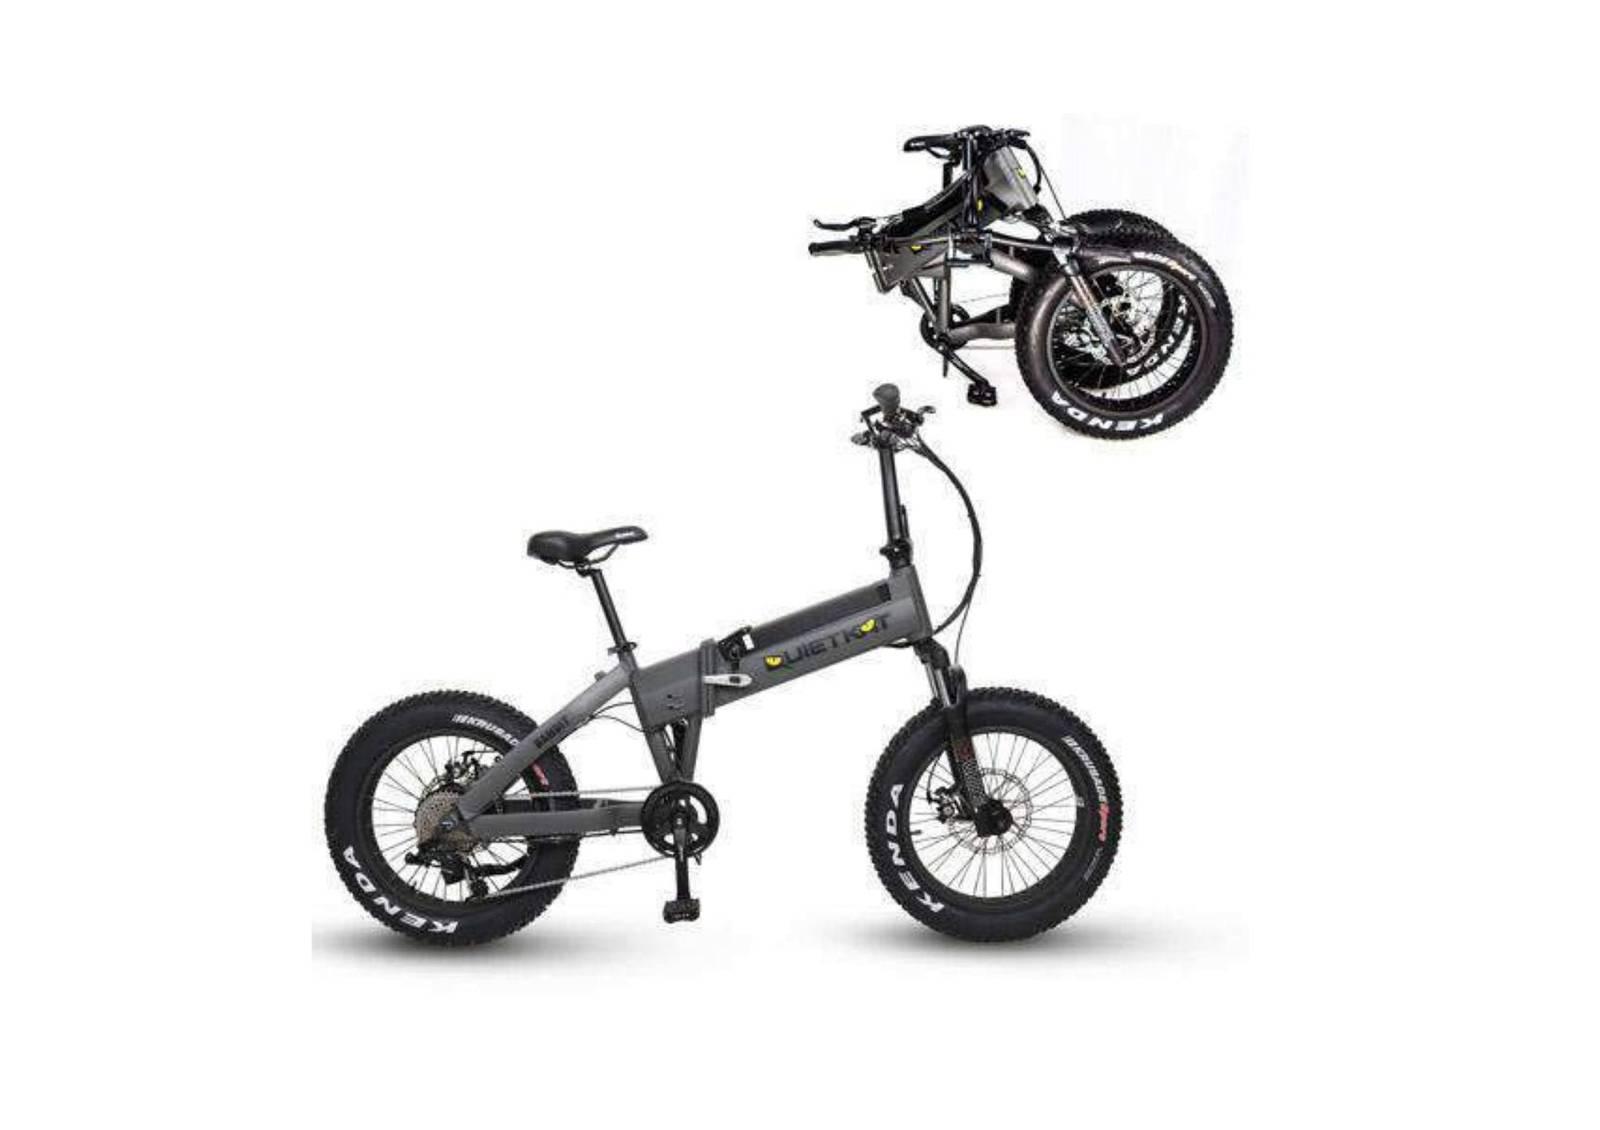 QuietKat 2020 Voyager Folding Electric Bike A Review